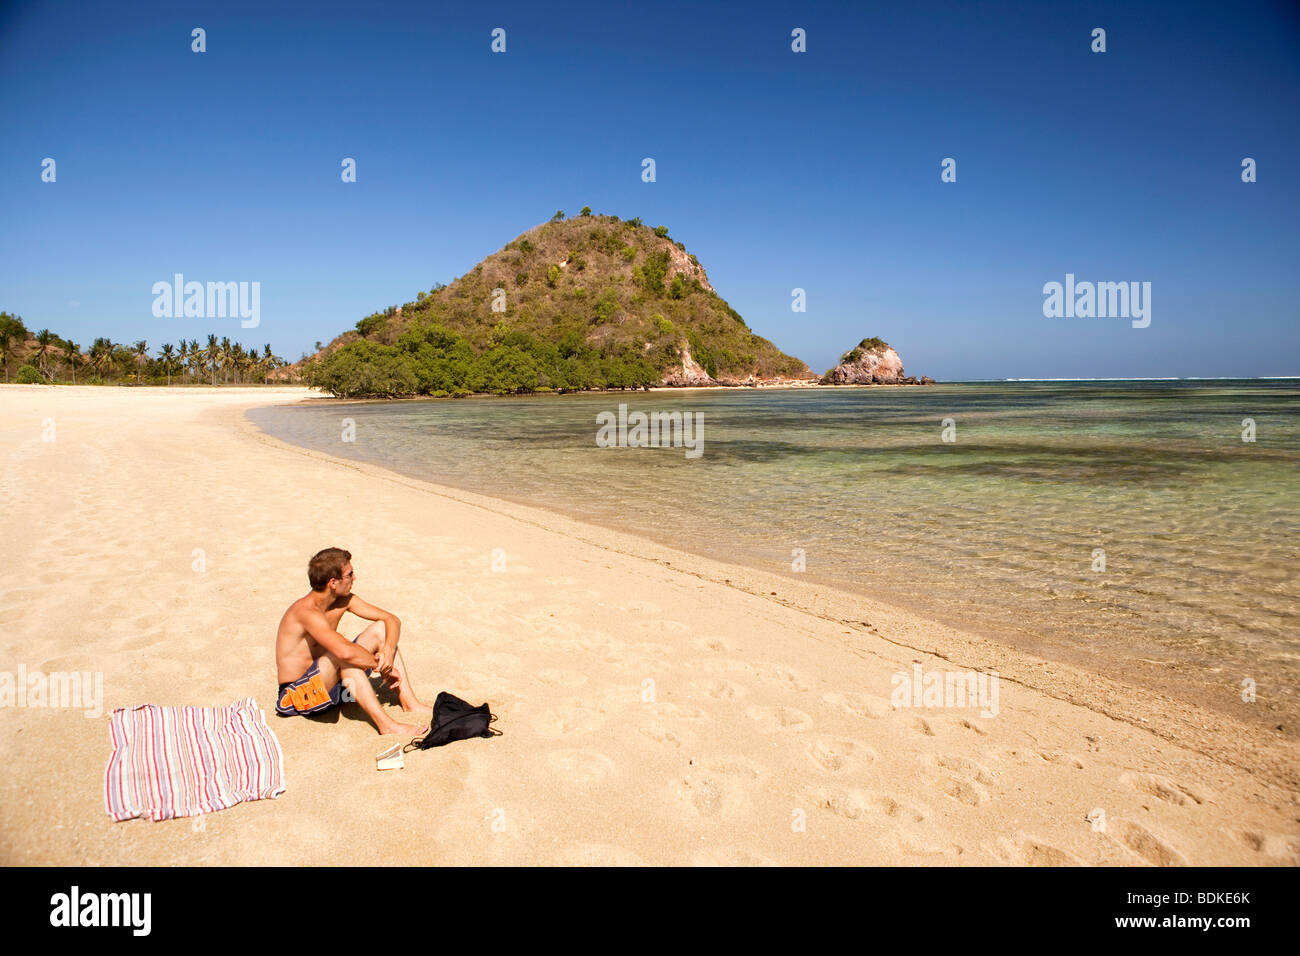 Indonesia, Lombok, Kuta, one solitary male sunbather on the beach - Stock Image